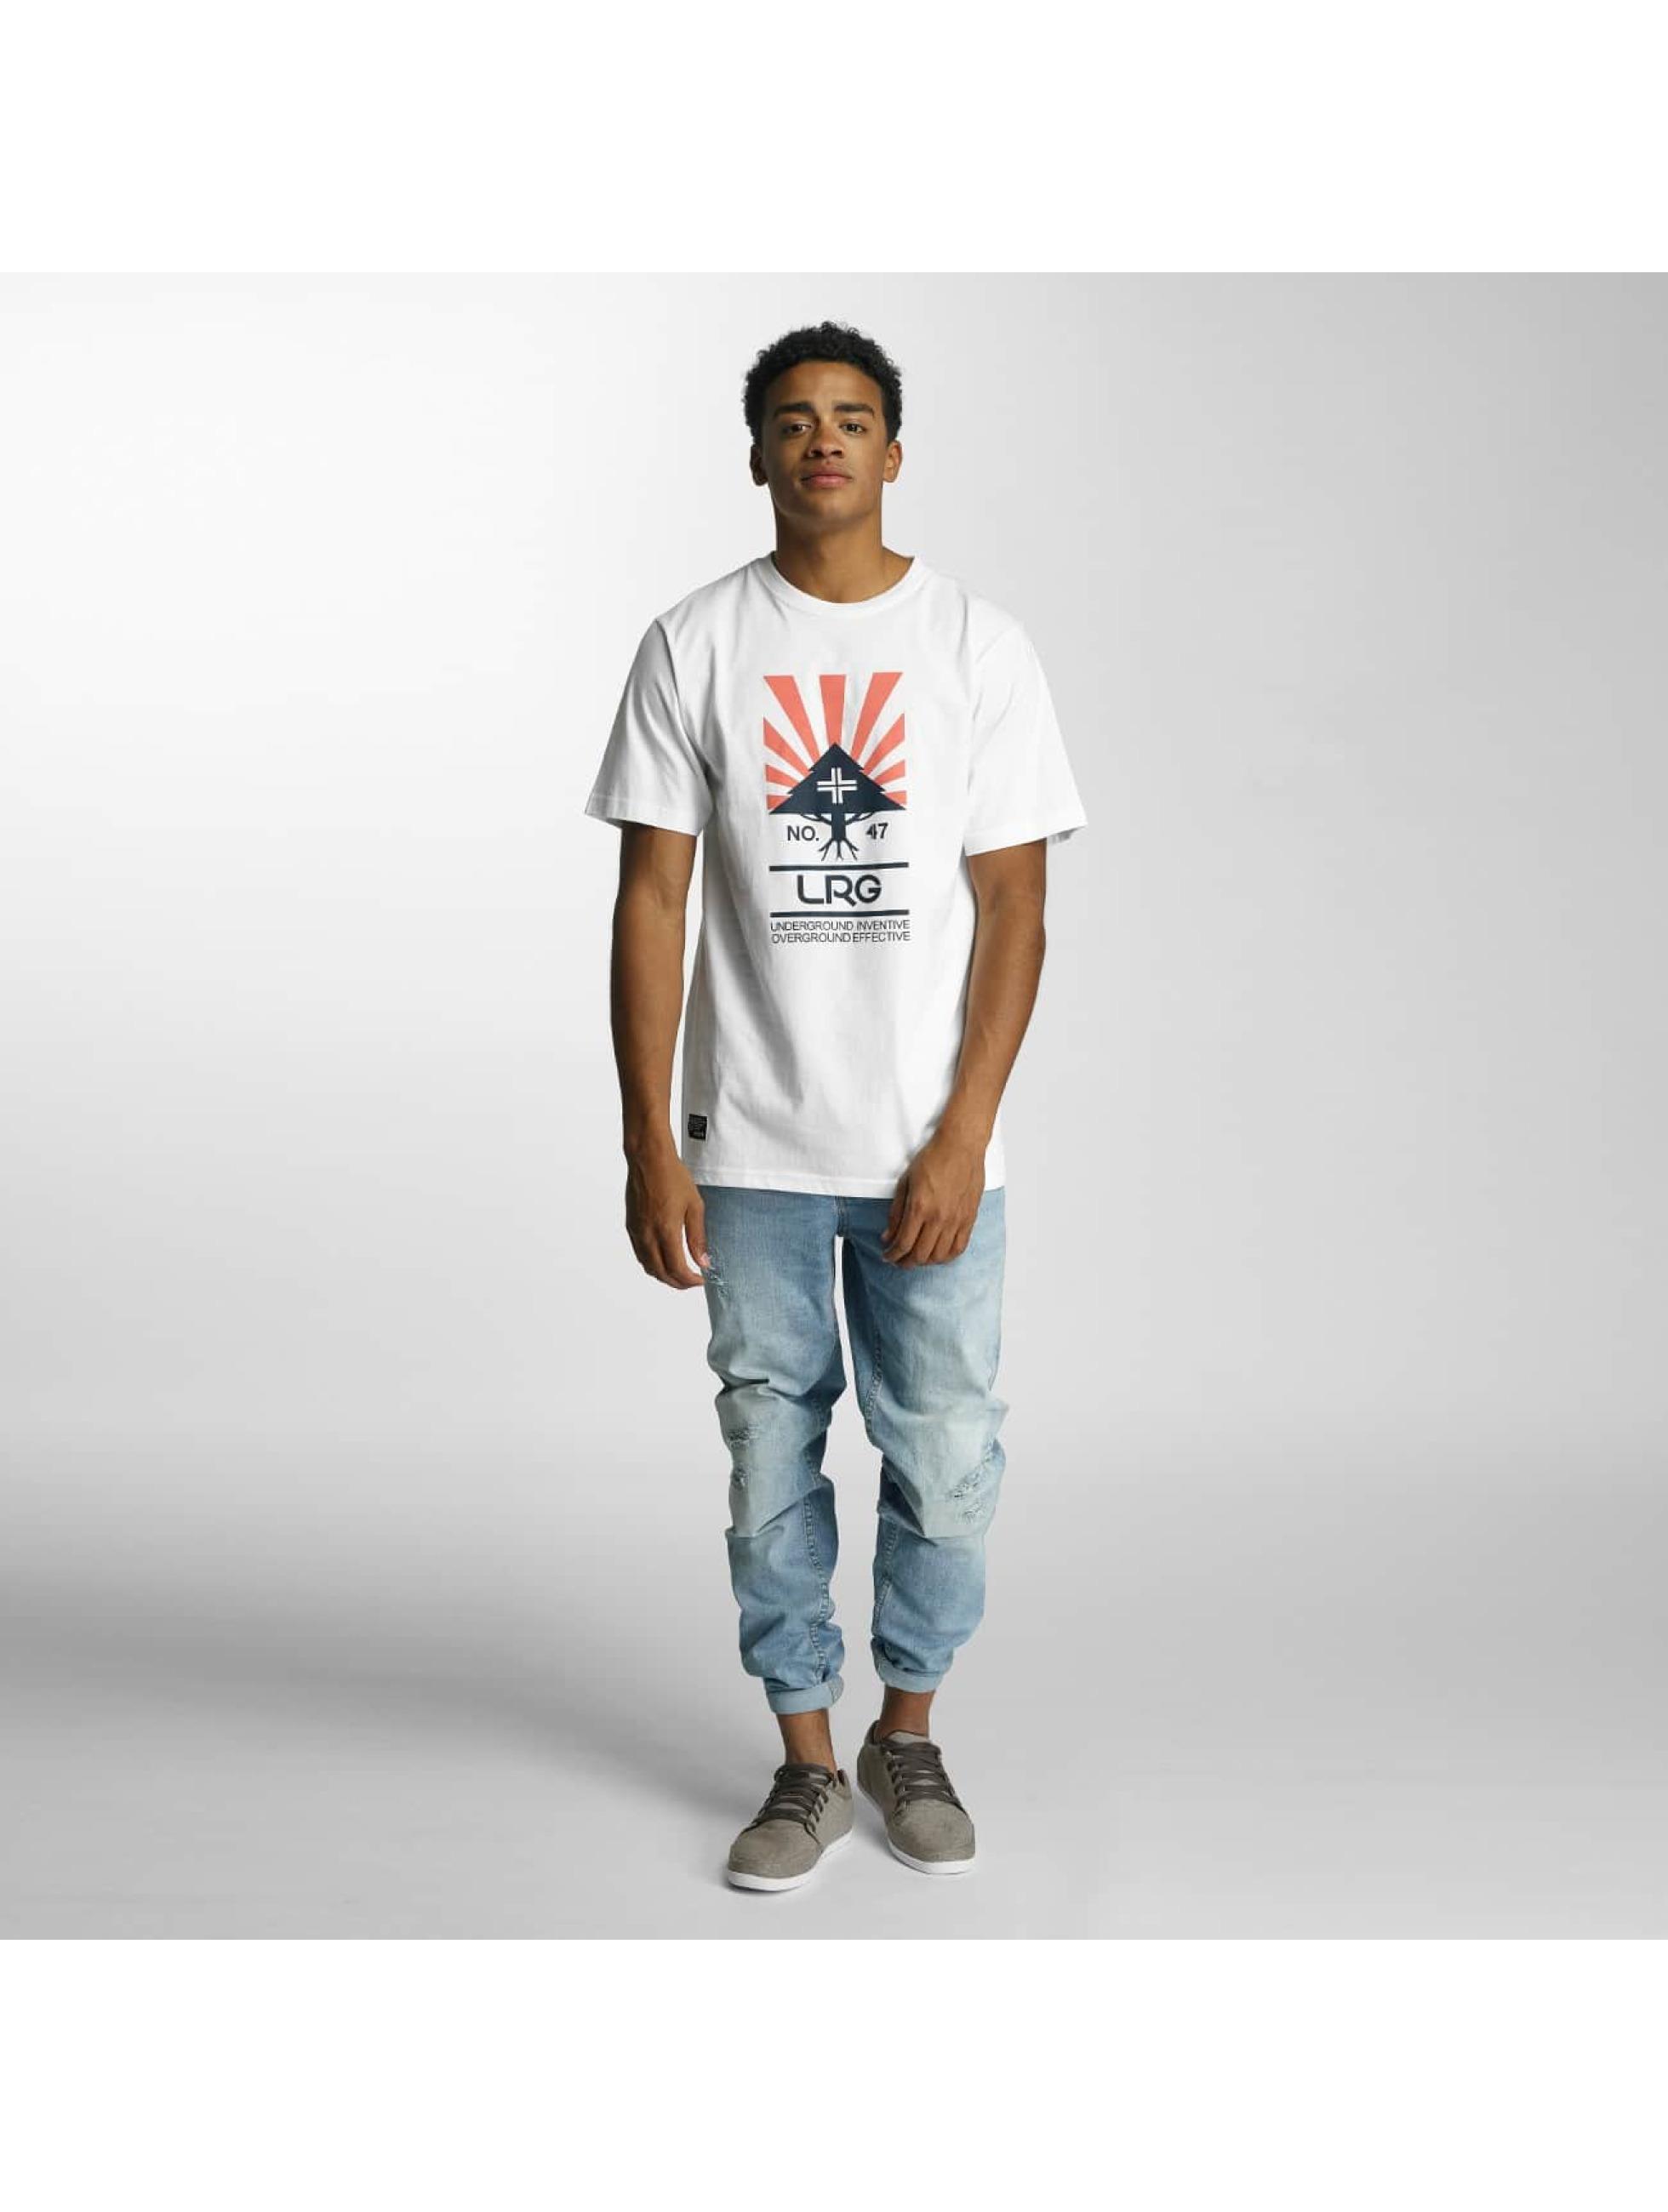 LRG Camiseta Grind blanco